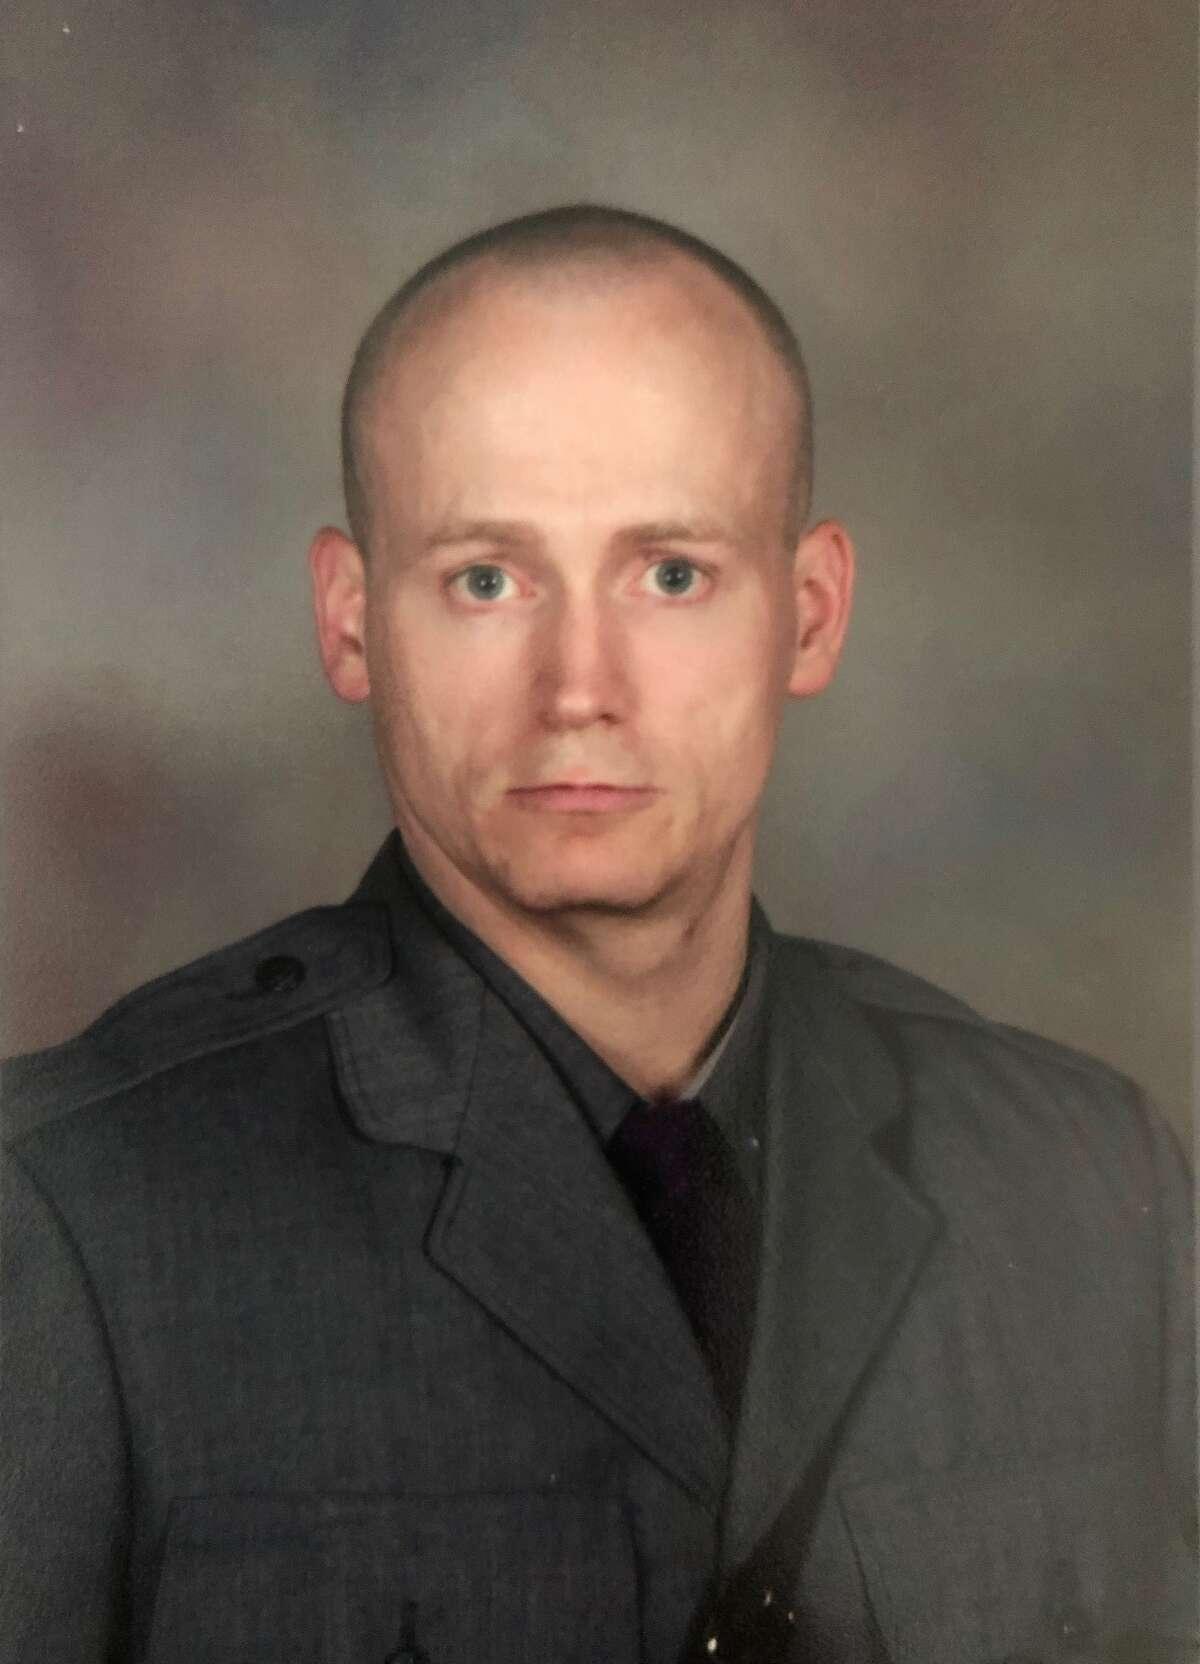 Trooper Jeremy J. VanNostrand